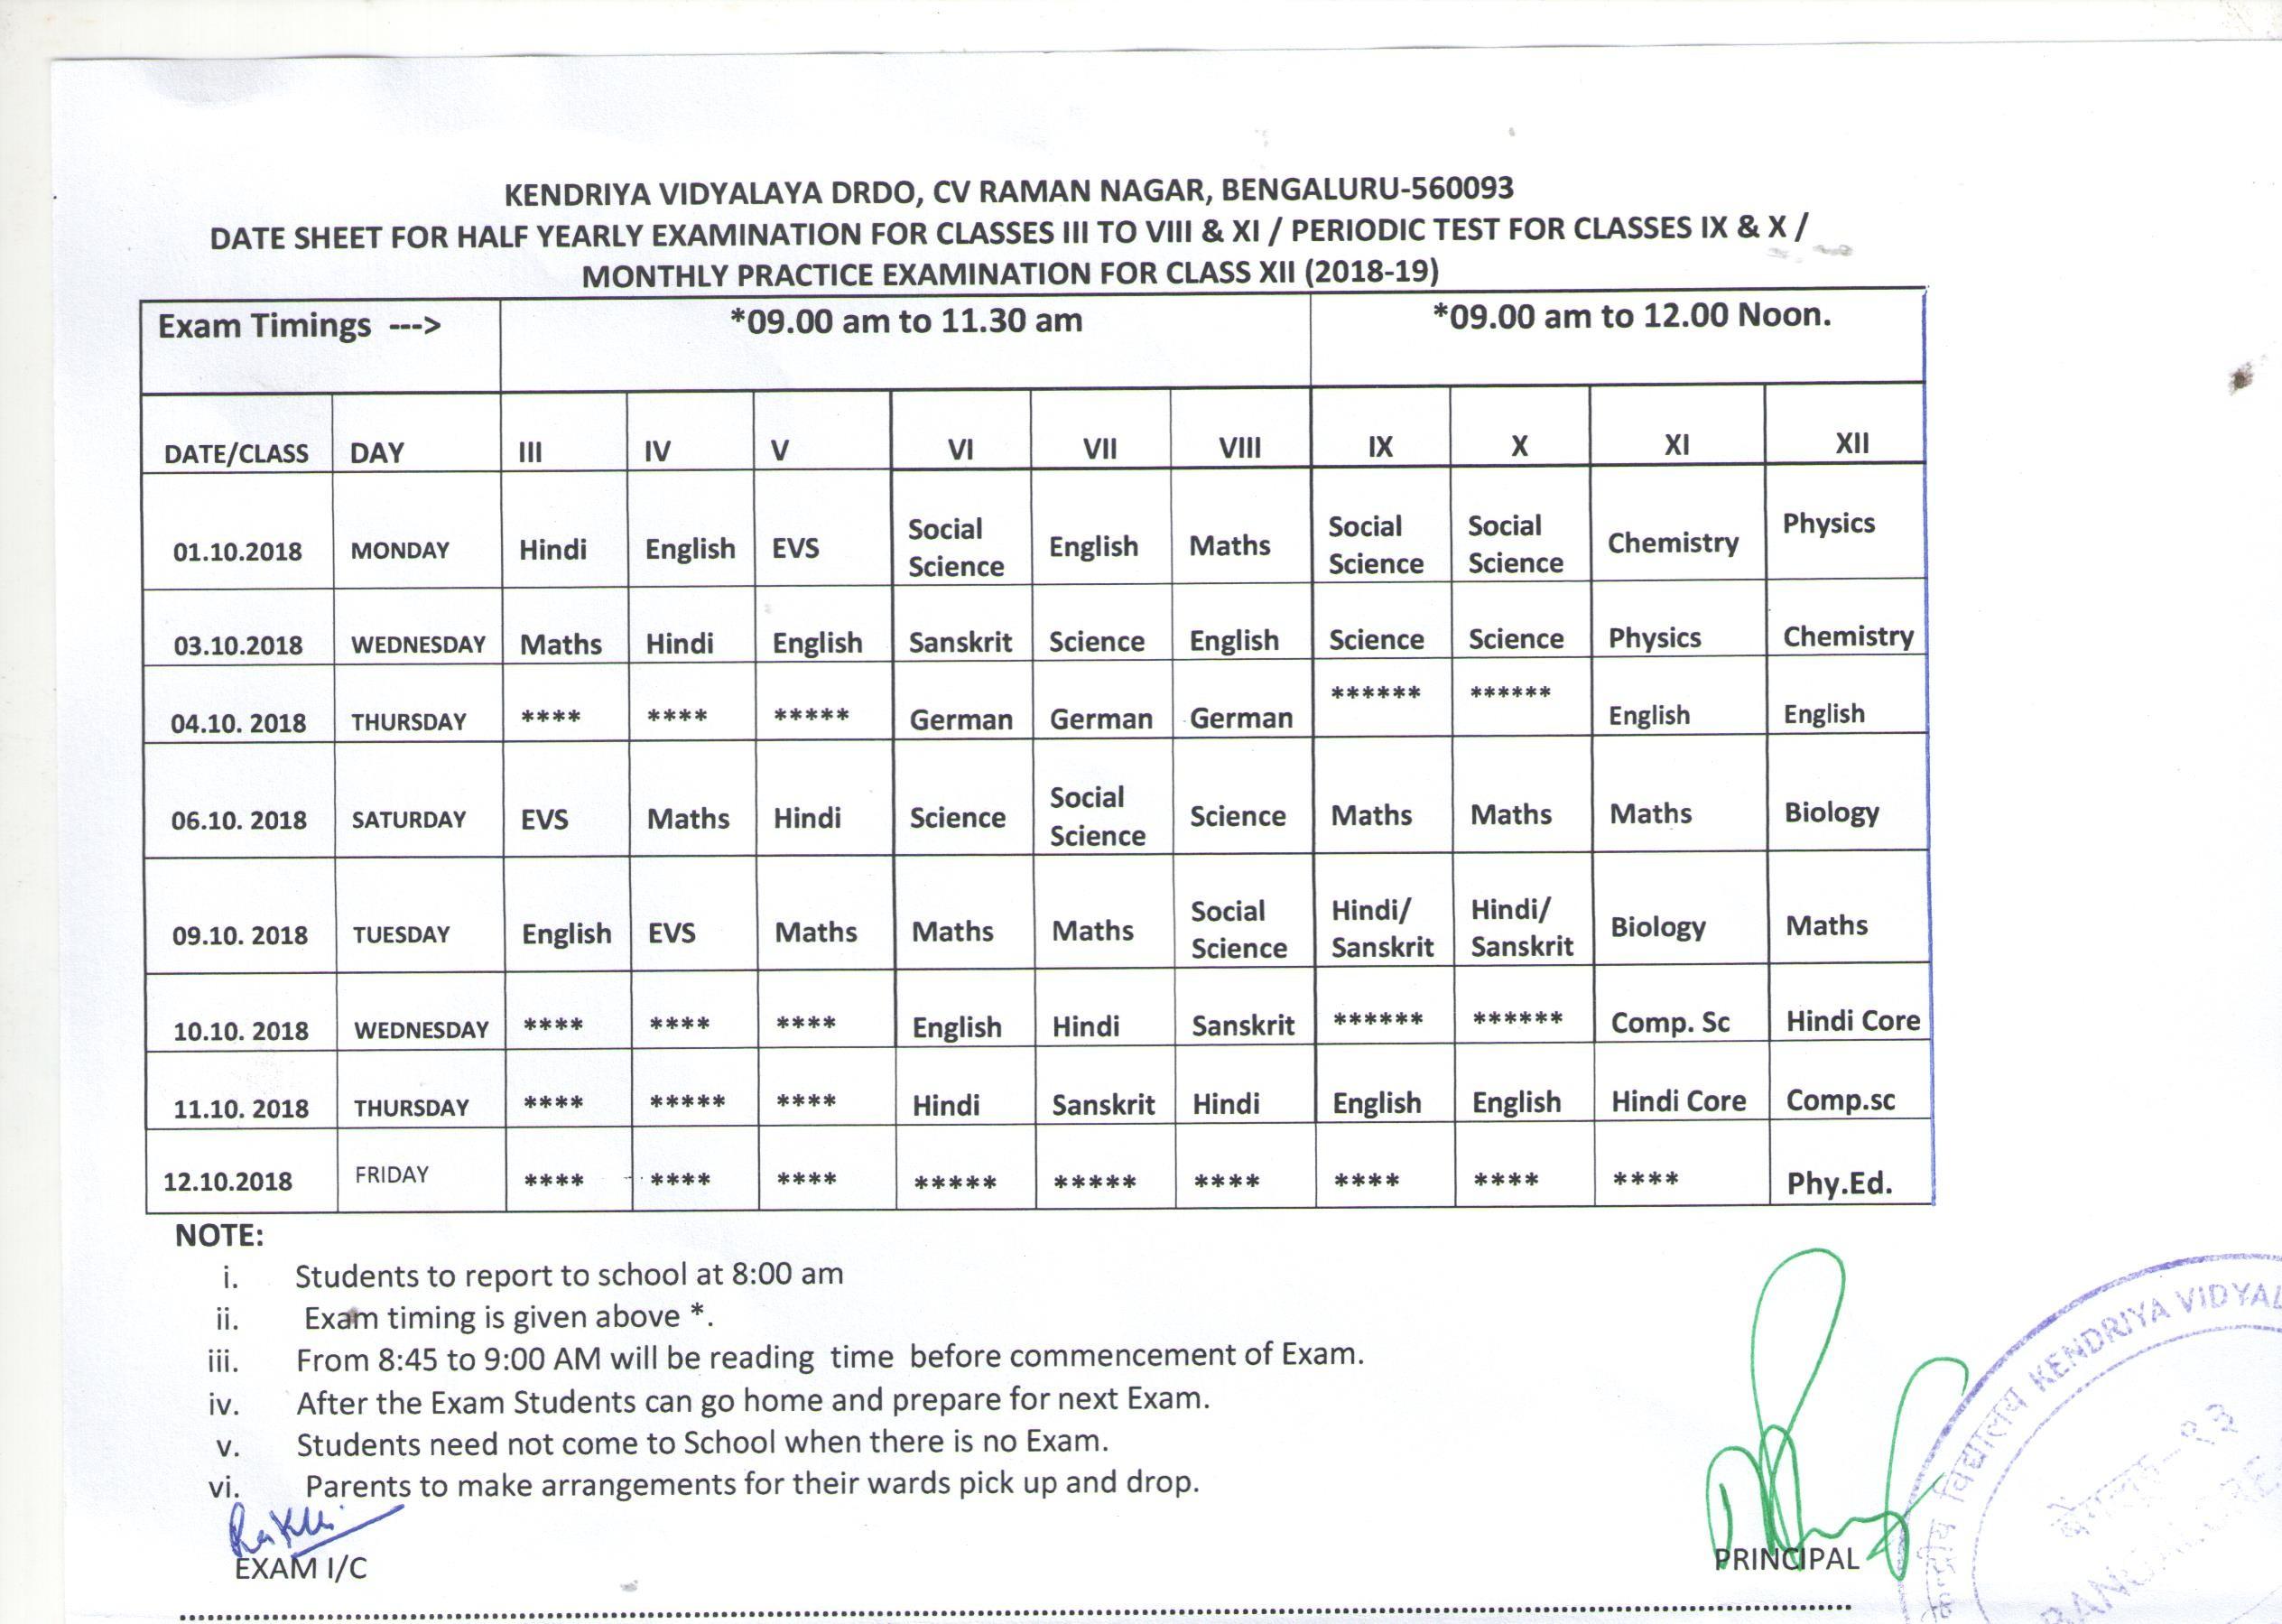 Malayalam Calendar 2019 Pdf Download Más Recientes Kendriya Vidyalaya Drdo Of Malayalam Calendar 2019 Pdf Download Más Recientemente Liberado Calendar 2019 Pdf T